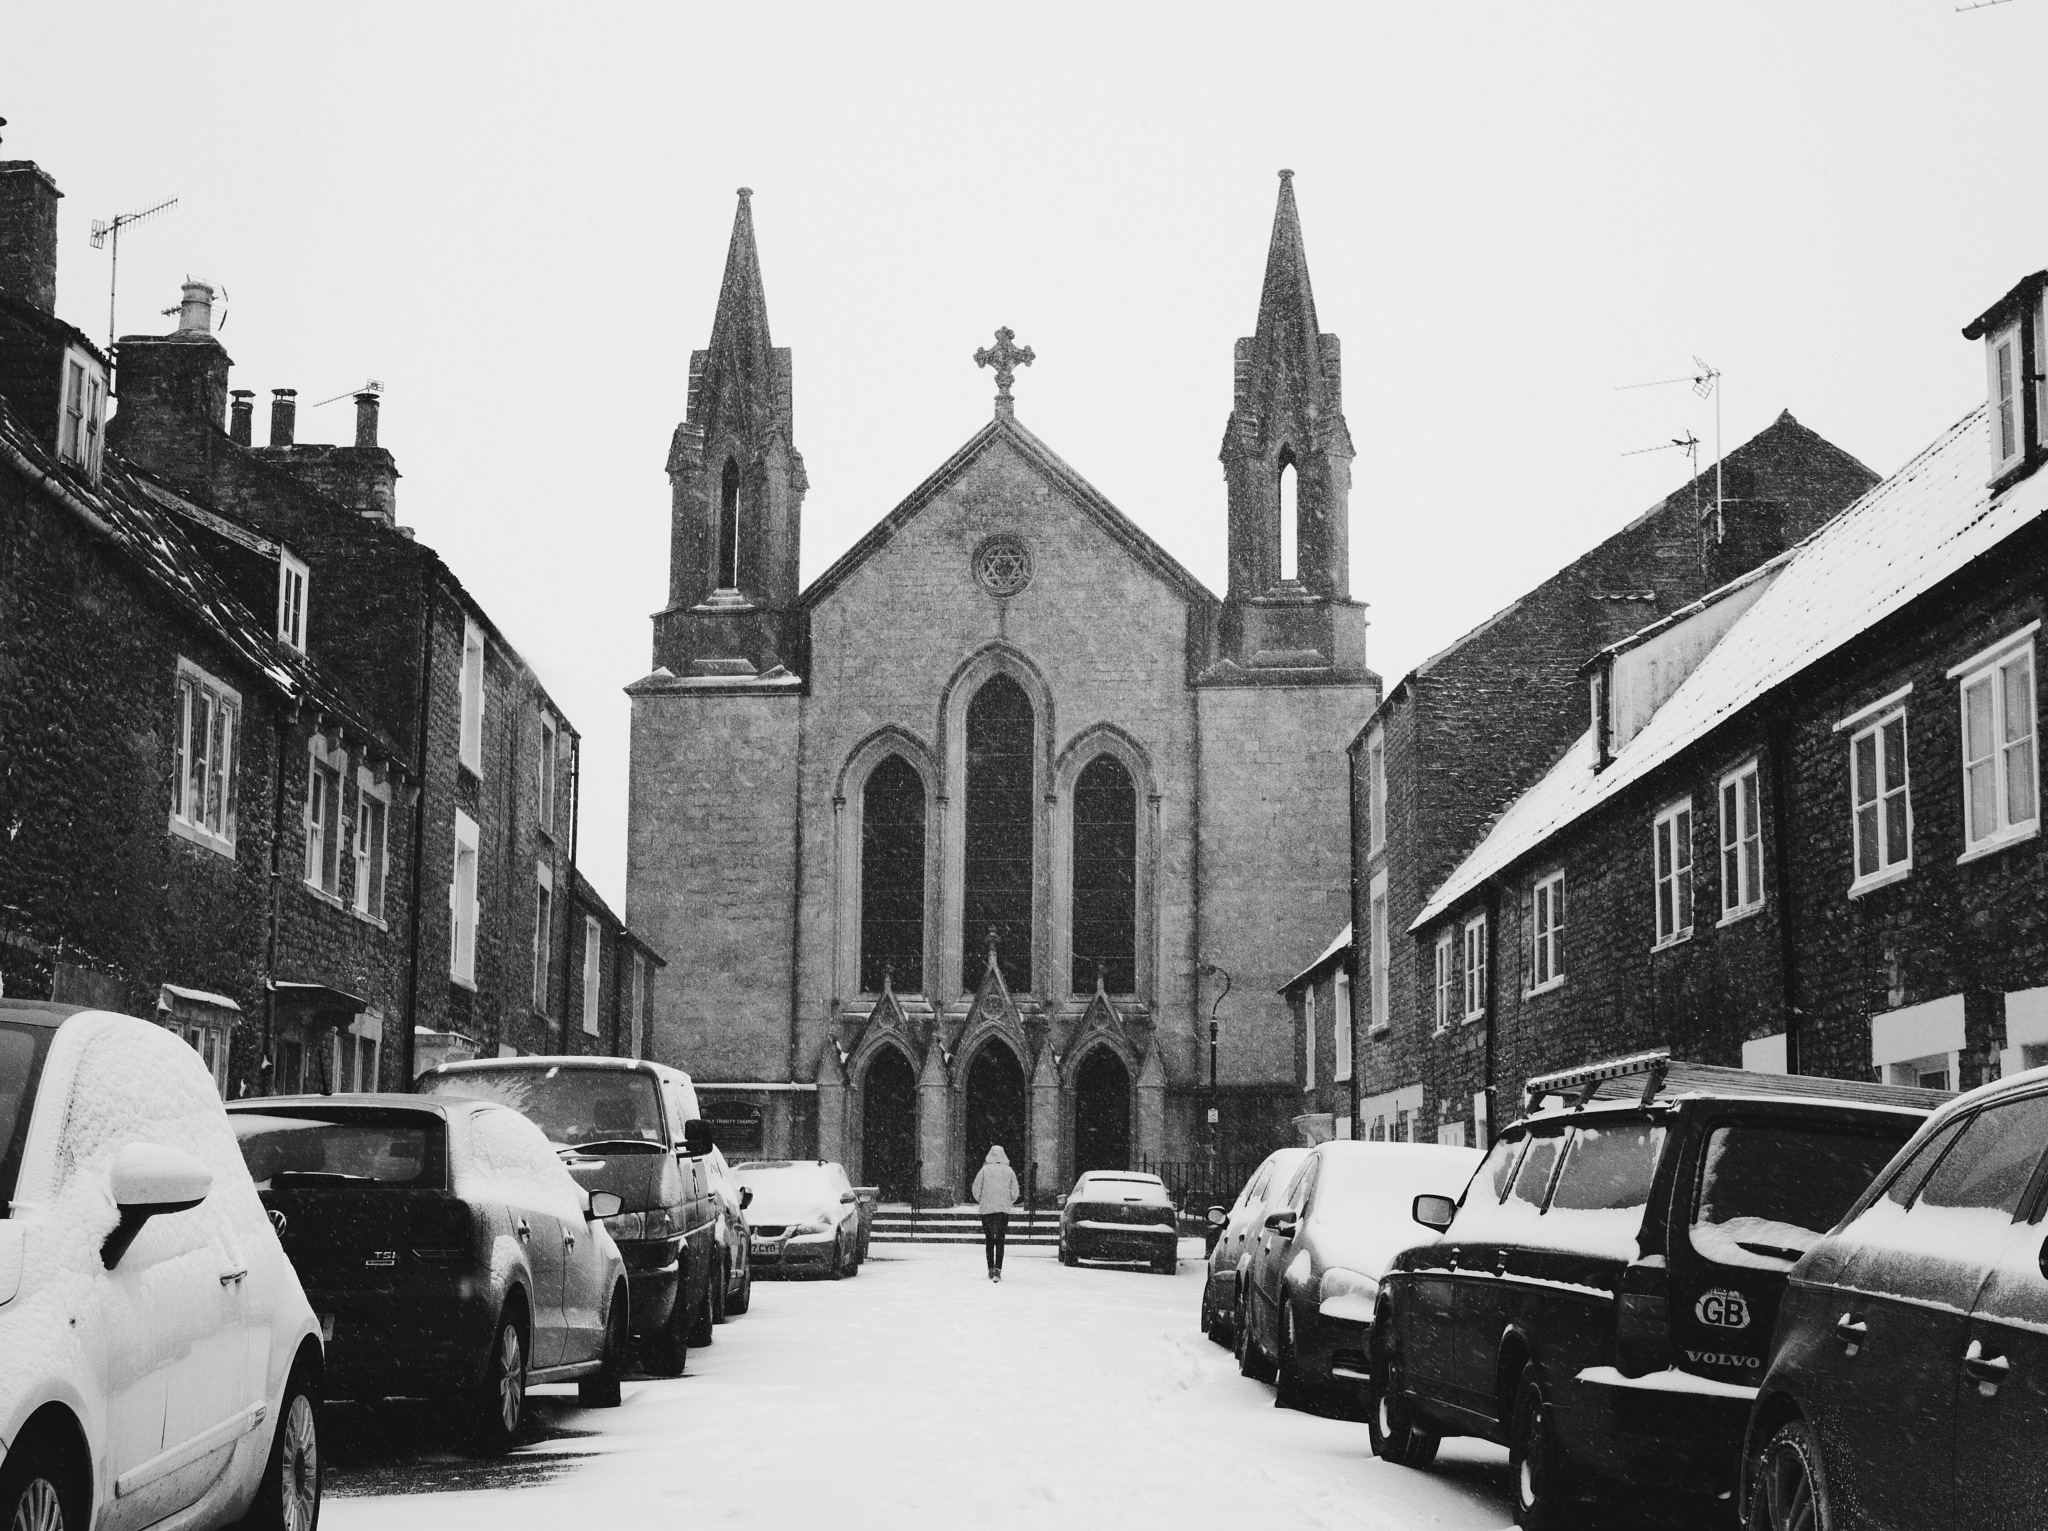 Trinity Church in the Snow by Daniel Weston